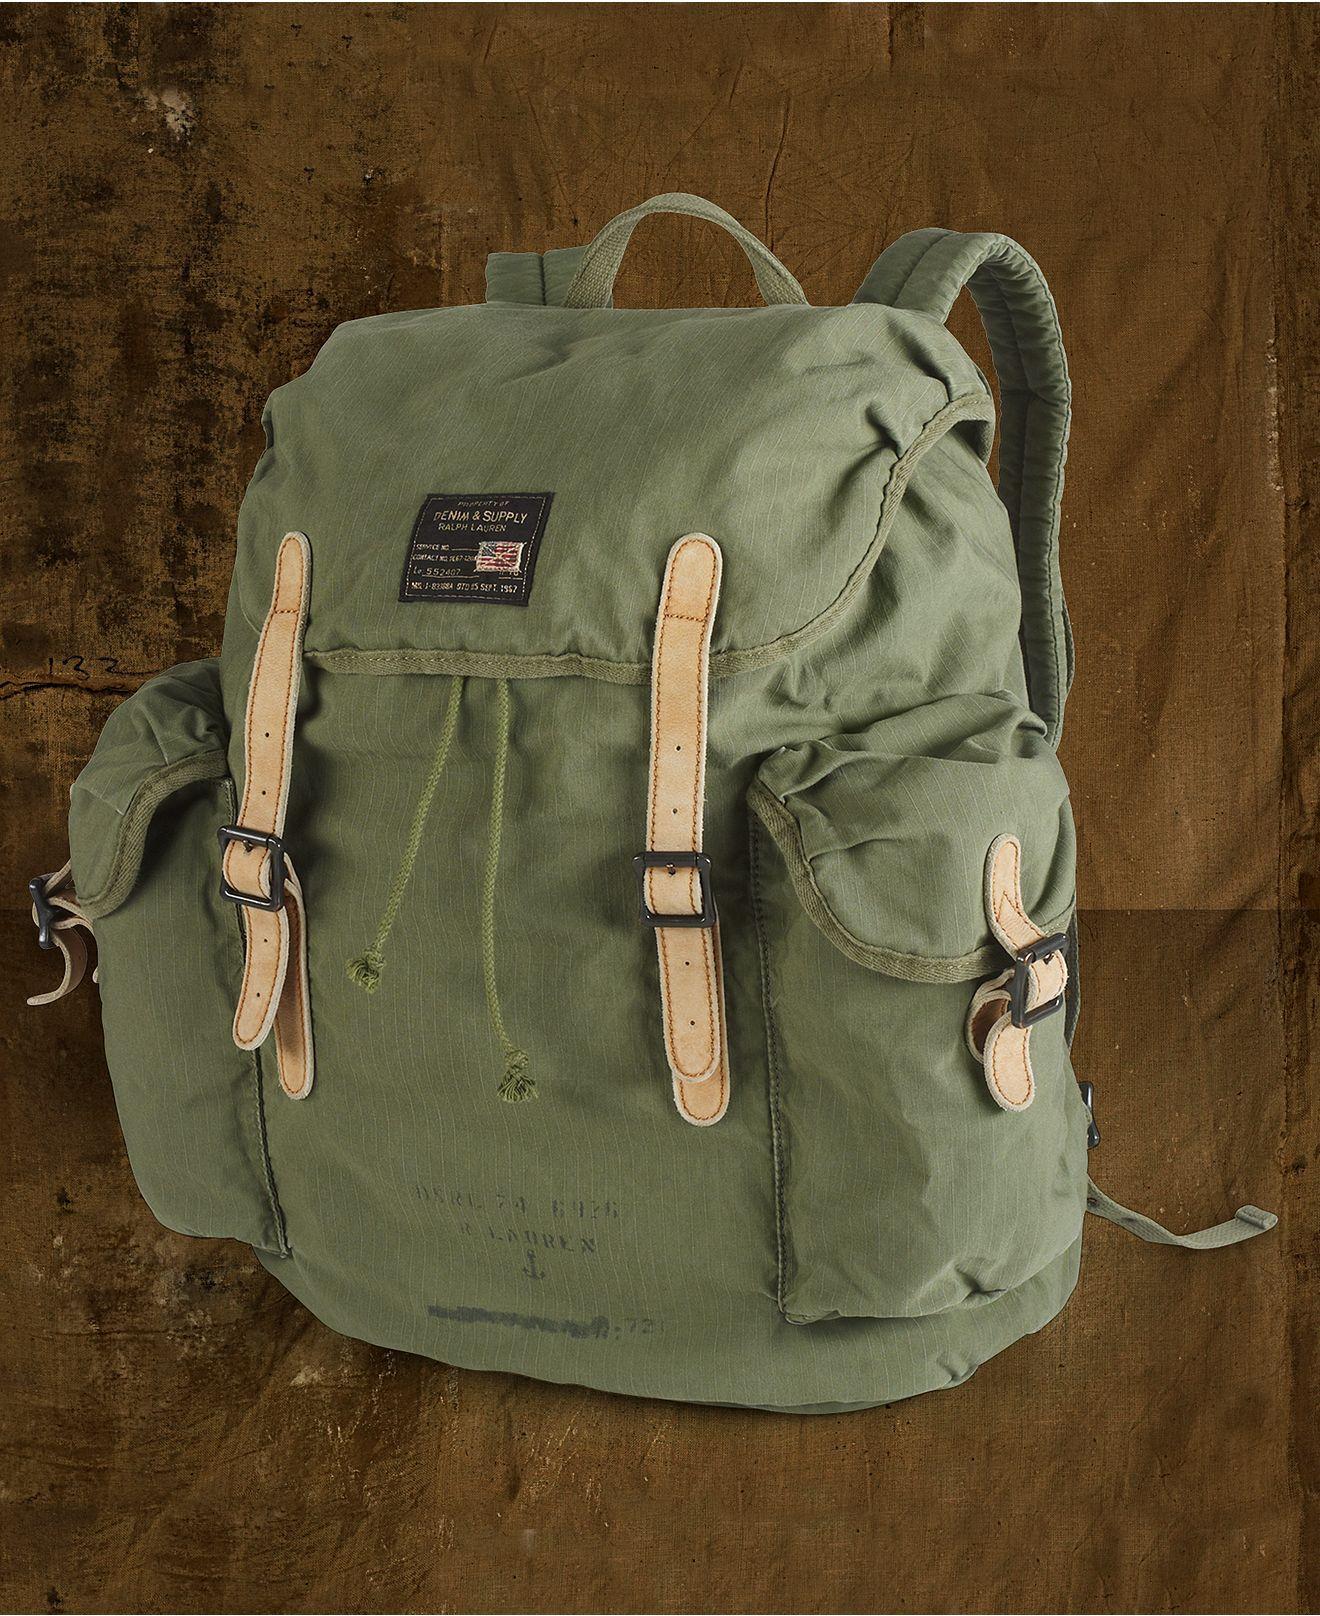 Denim   Supply Ralph Lauren Bag 4982f2f69db62